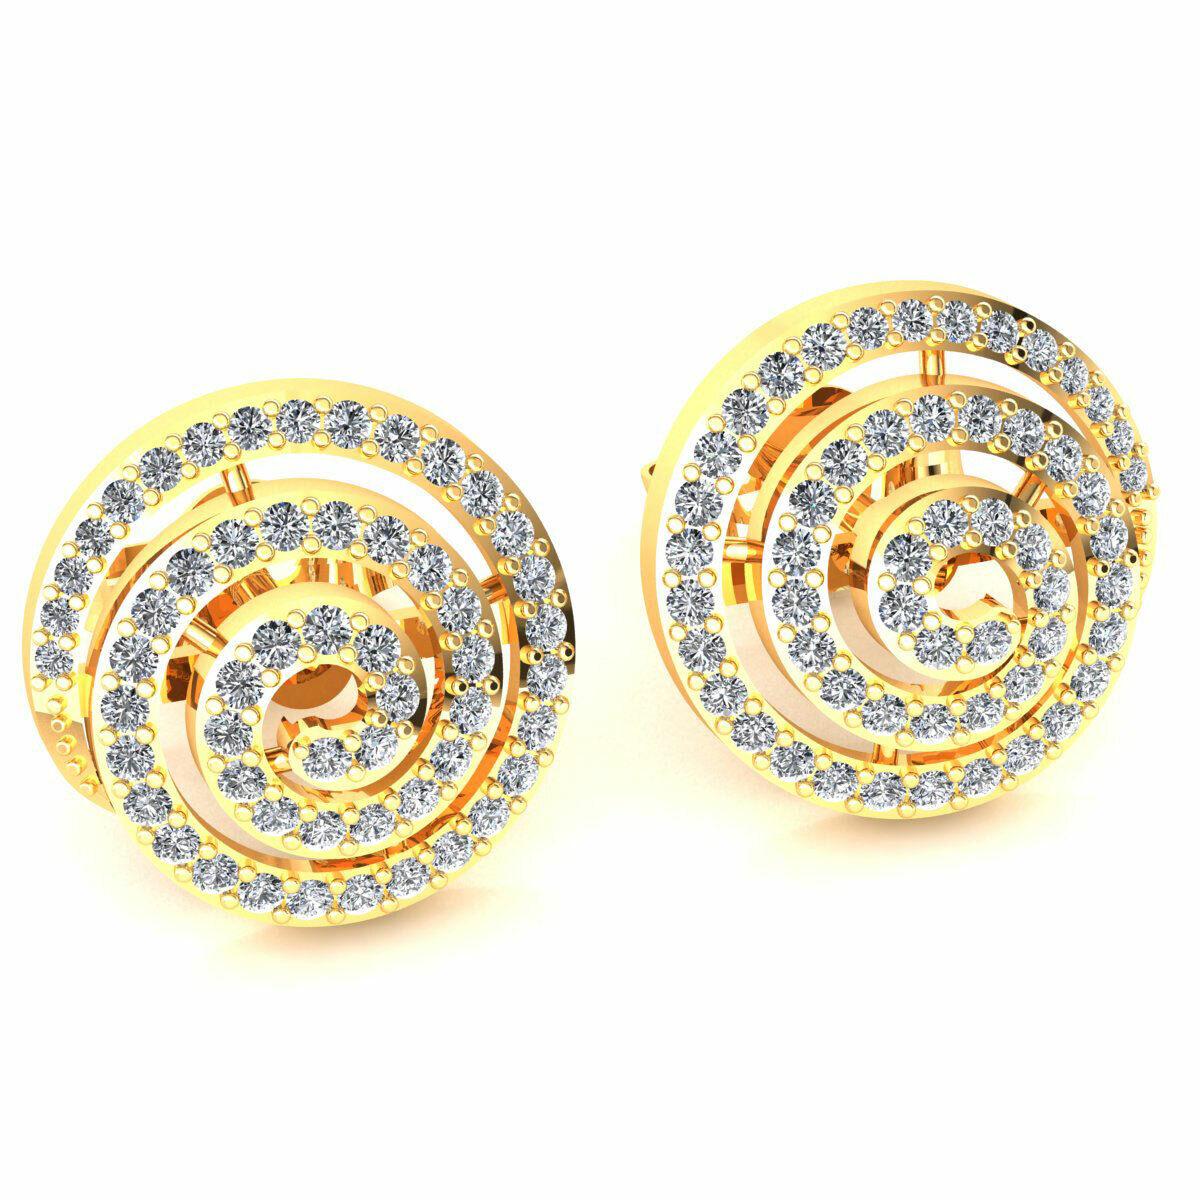 0.6ct Round Cut Not Enhanced Diamond Ladies Swirl Studs Earrings 10K gold